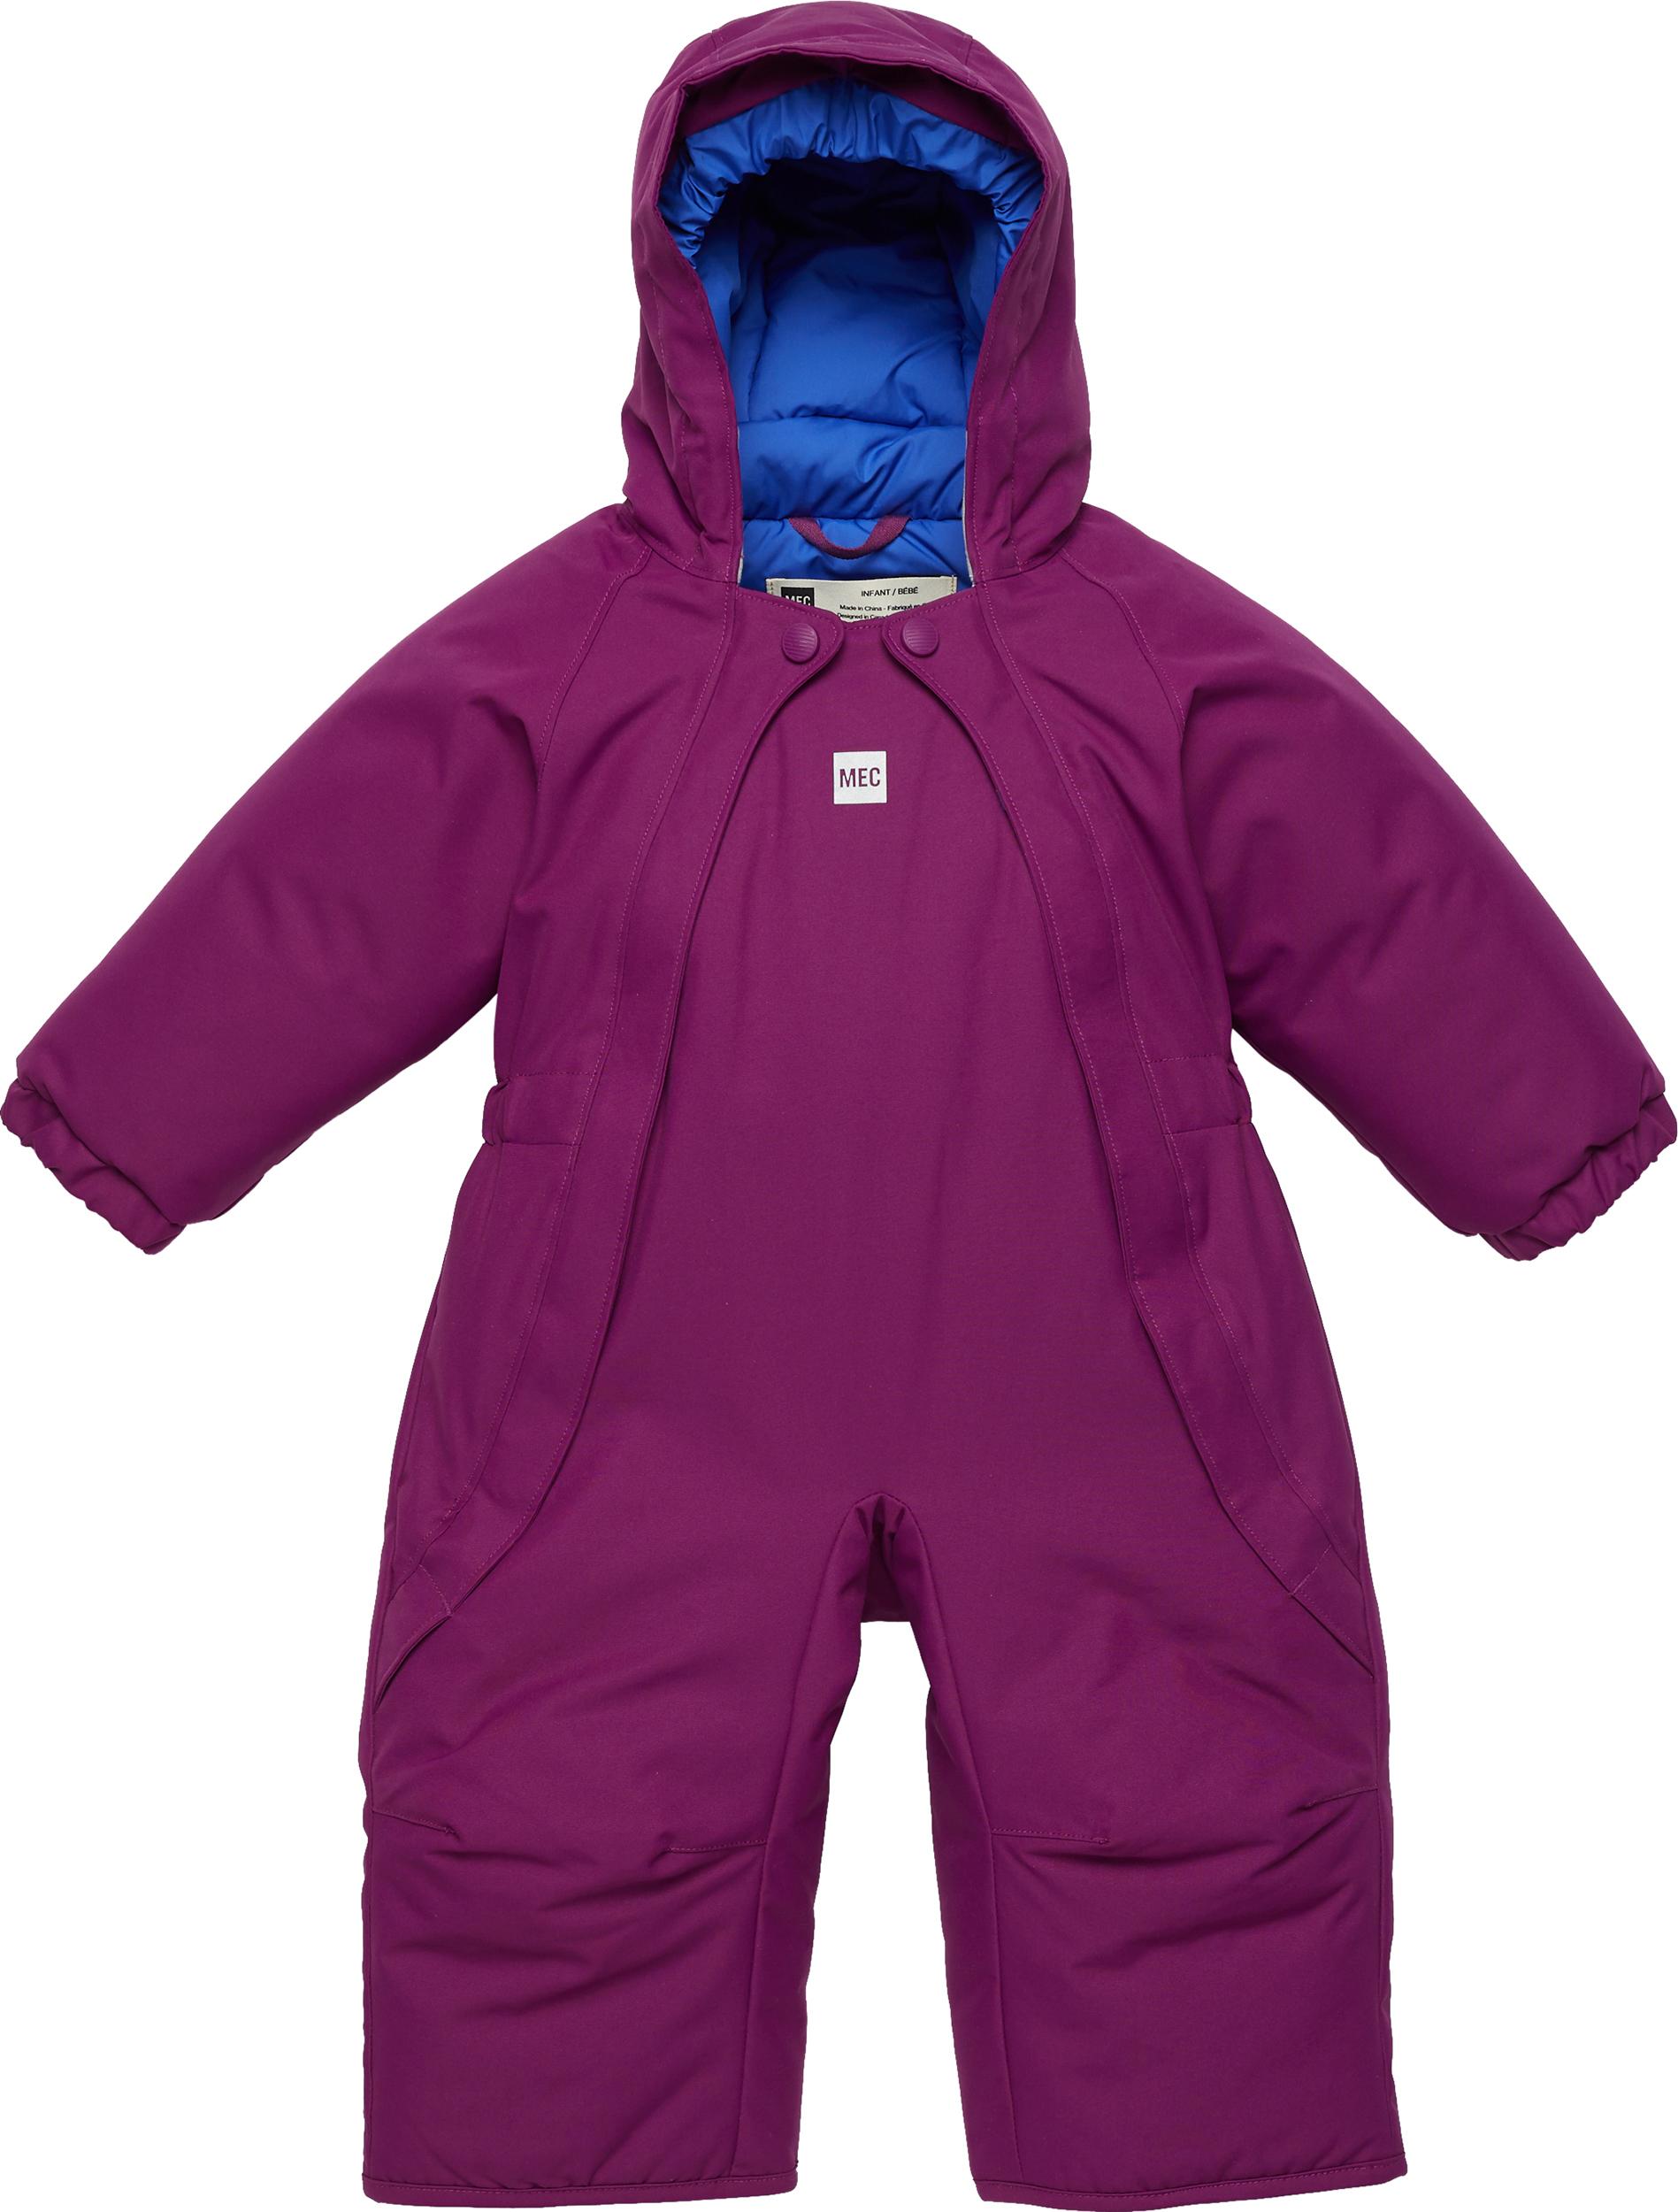 e2f6b9eb6 MEC Toaster Bunting Suit - Infants